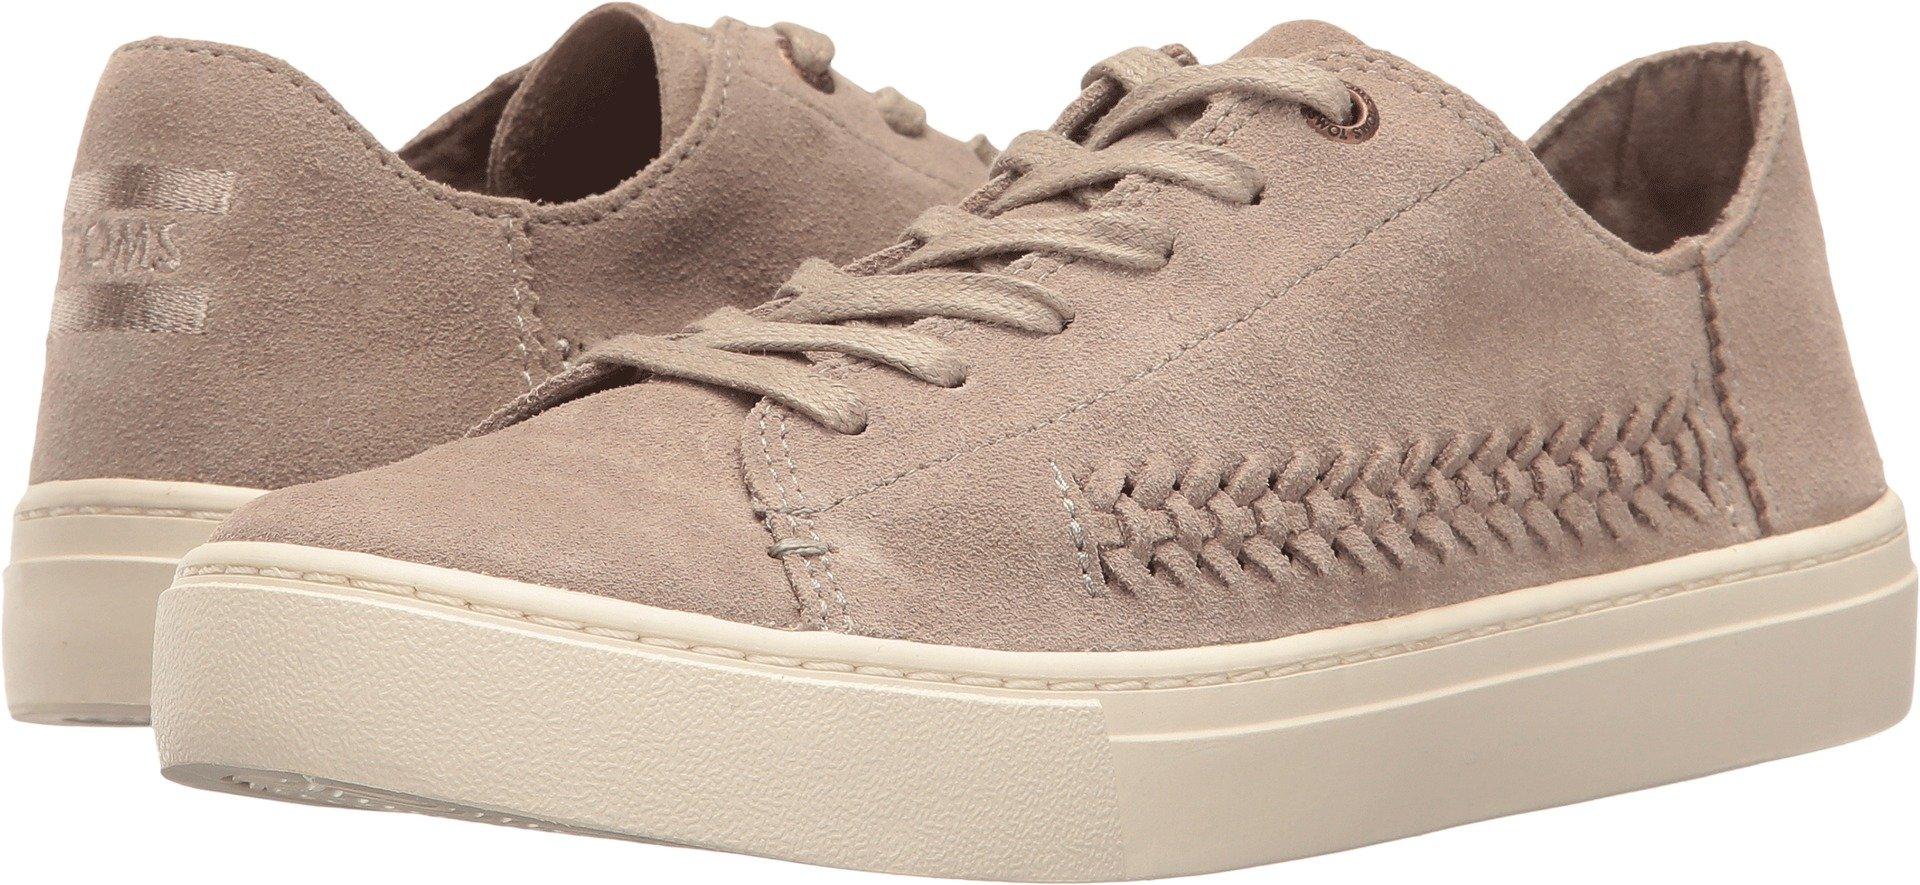 TOMS Women's Lenox Sneaker Desert Taupe Deconstructed Suede/Woven Panel 12 B US